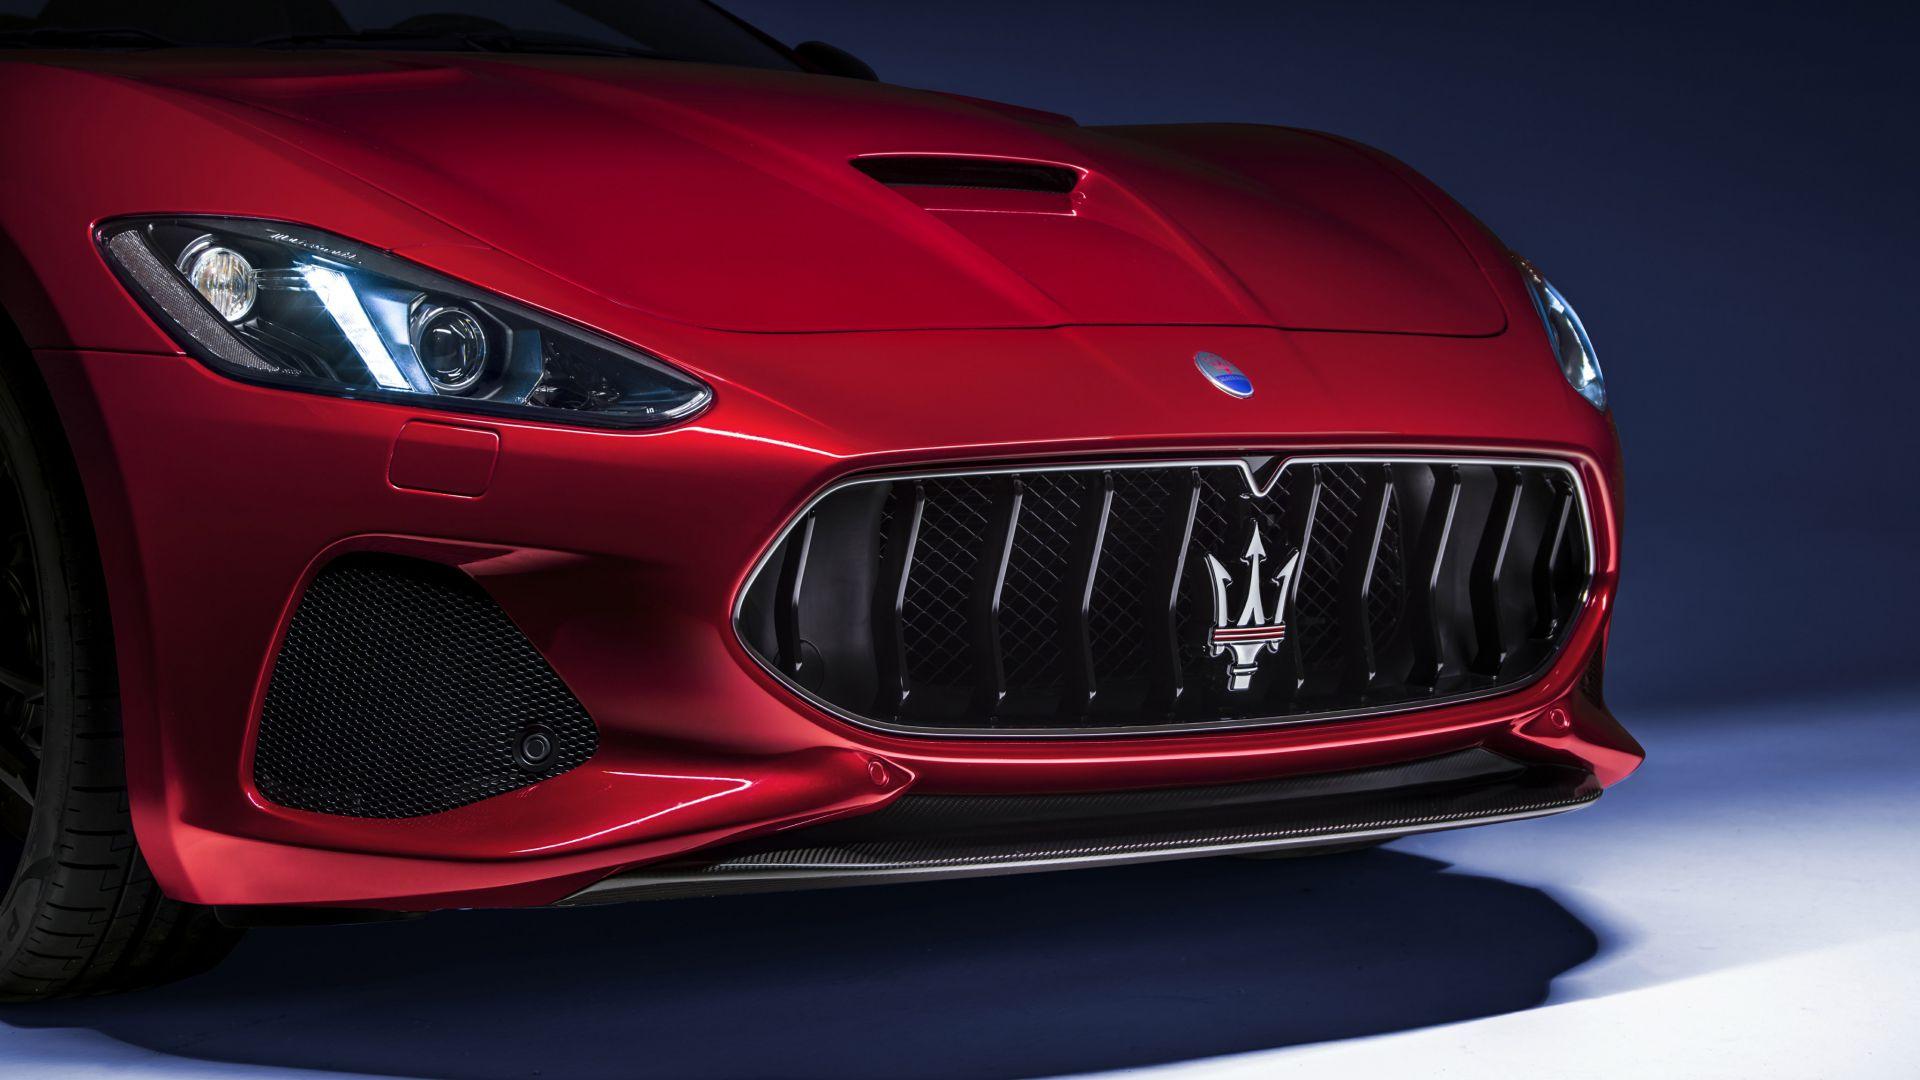 Wallpaper Maserati GranTurismo, 2018 car, bonnet, headlights